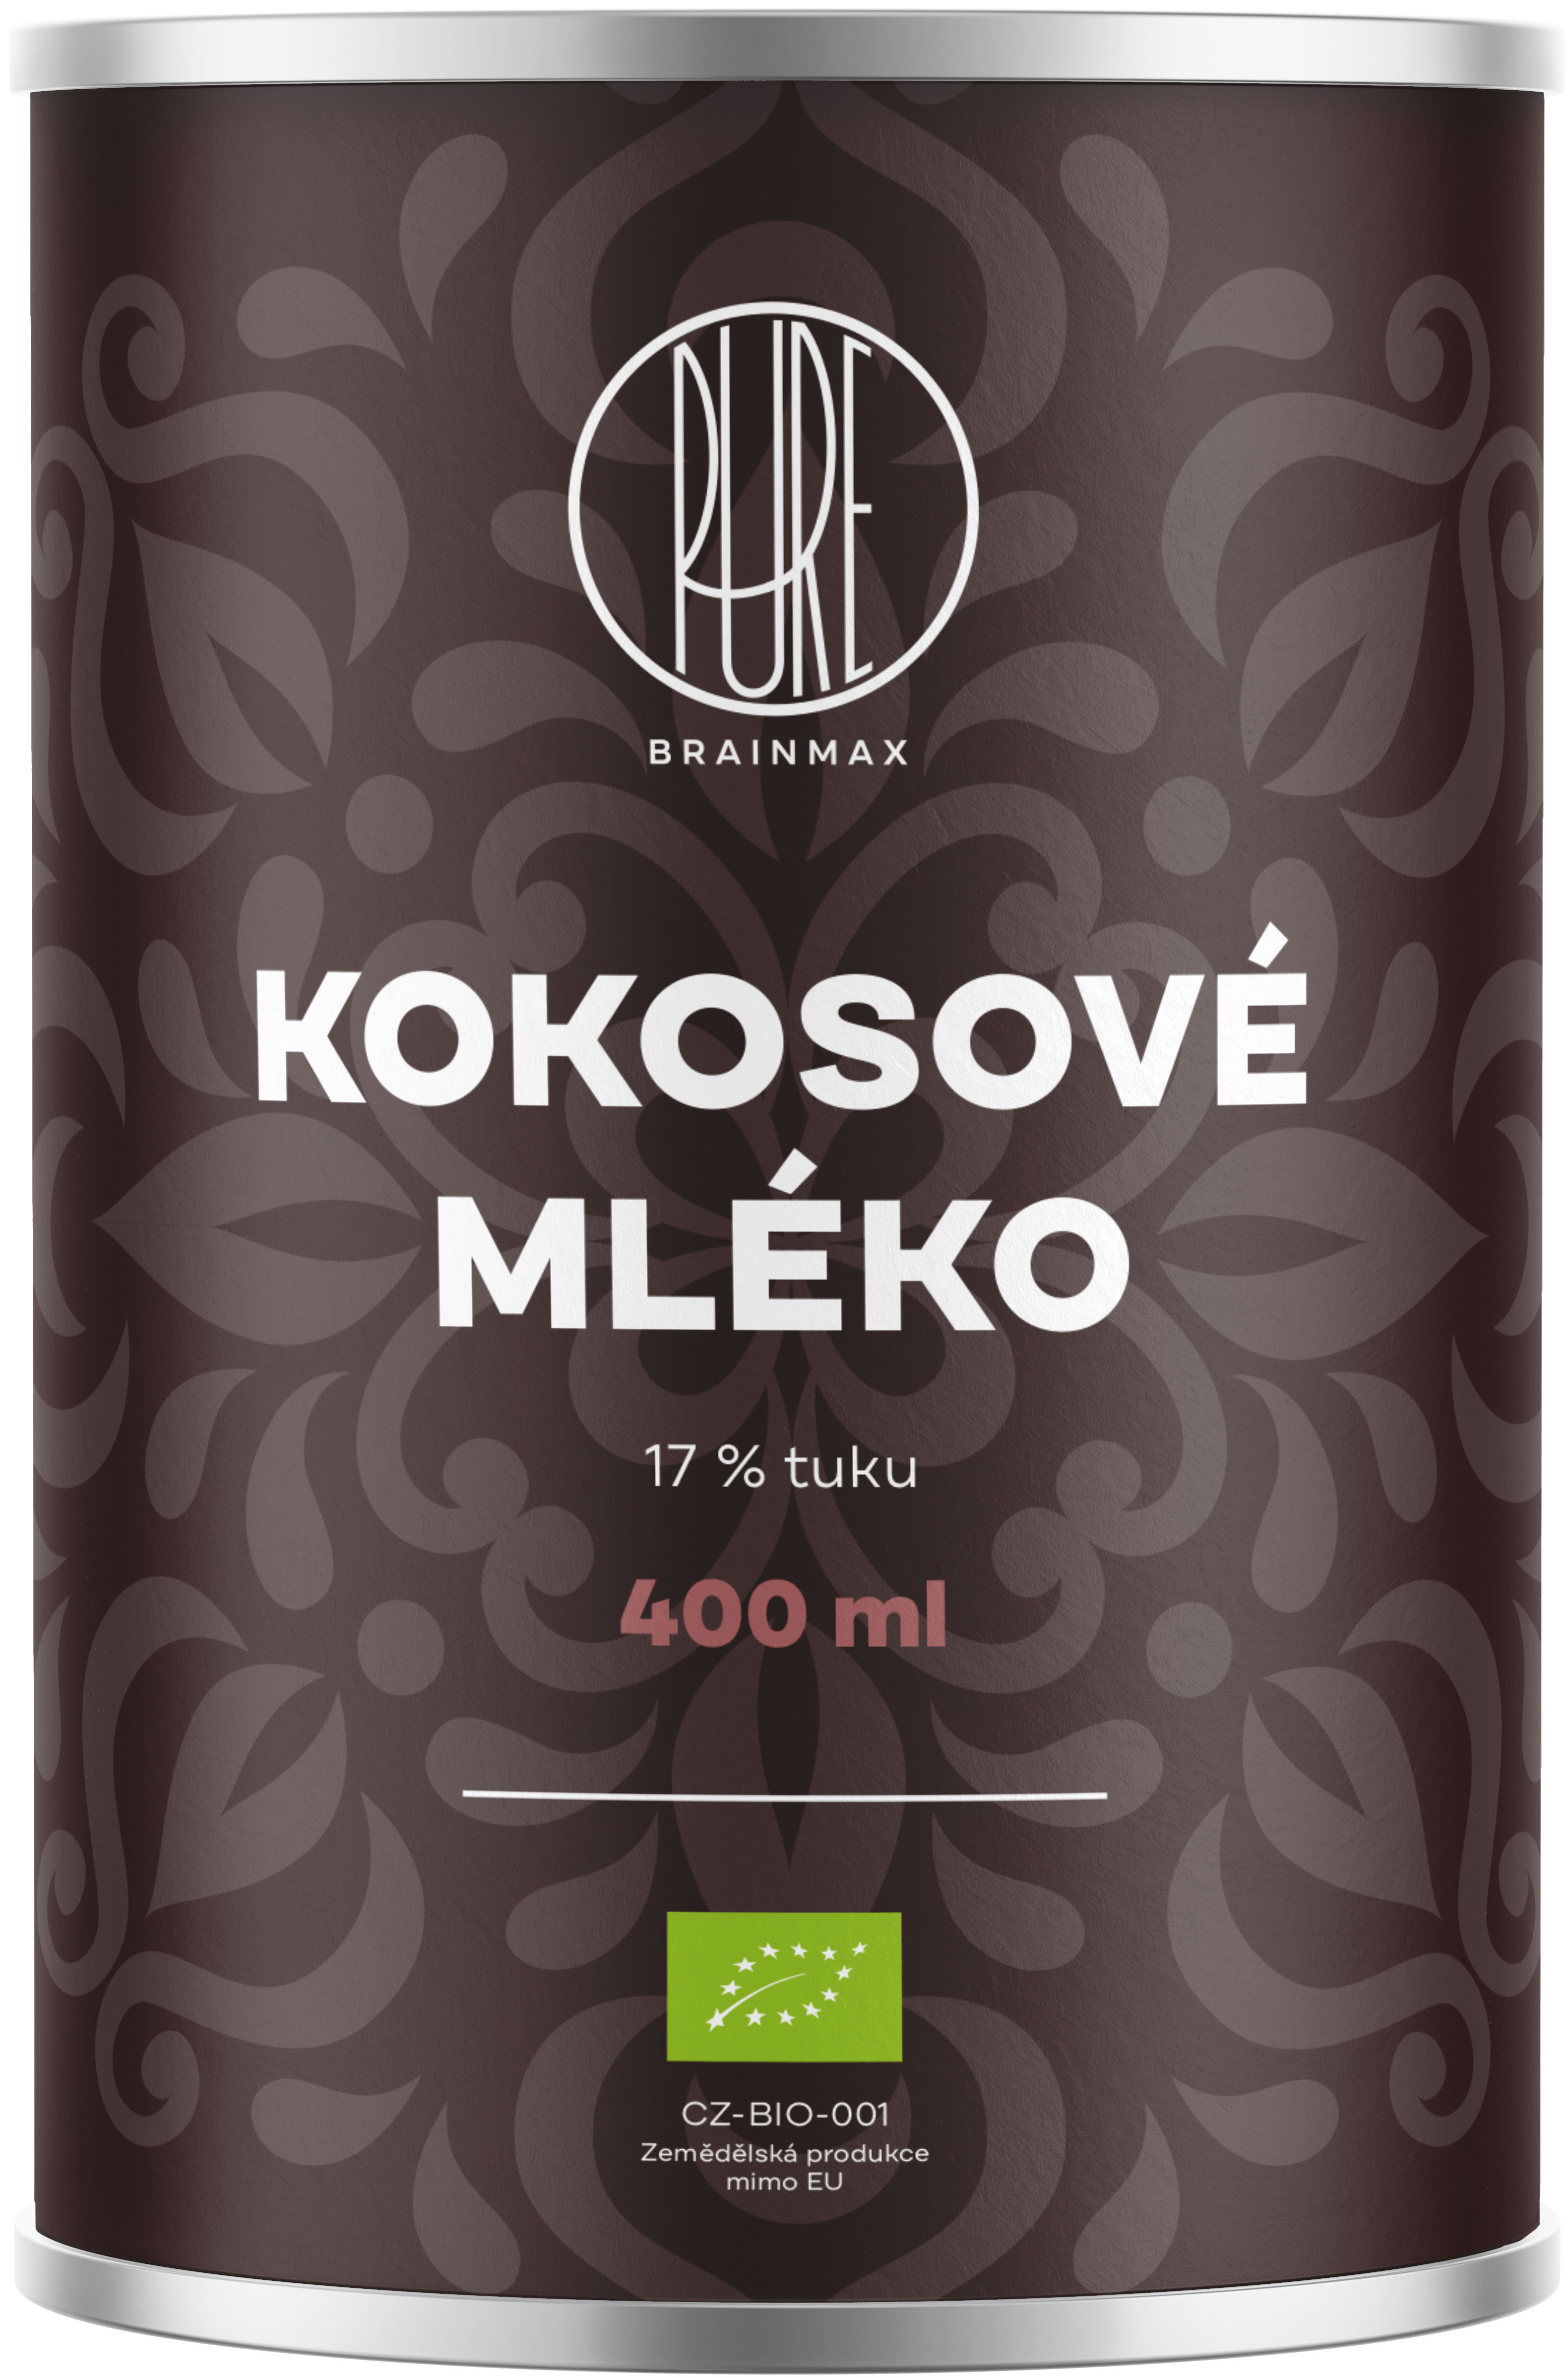 BrainMax Pure Kokosové mléko 17% tuku, BIO, 400 ml *CZ-BIO-001 certifikát